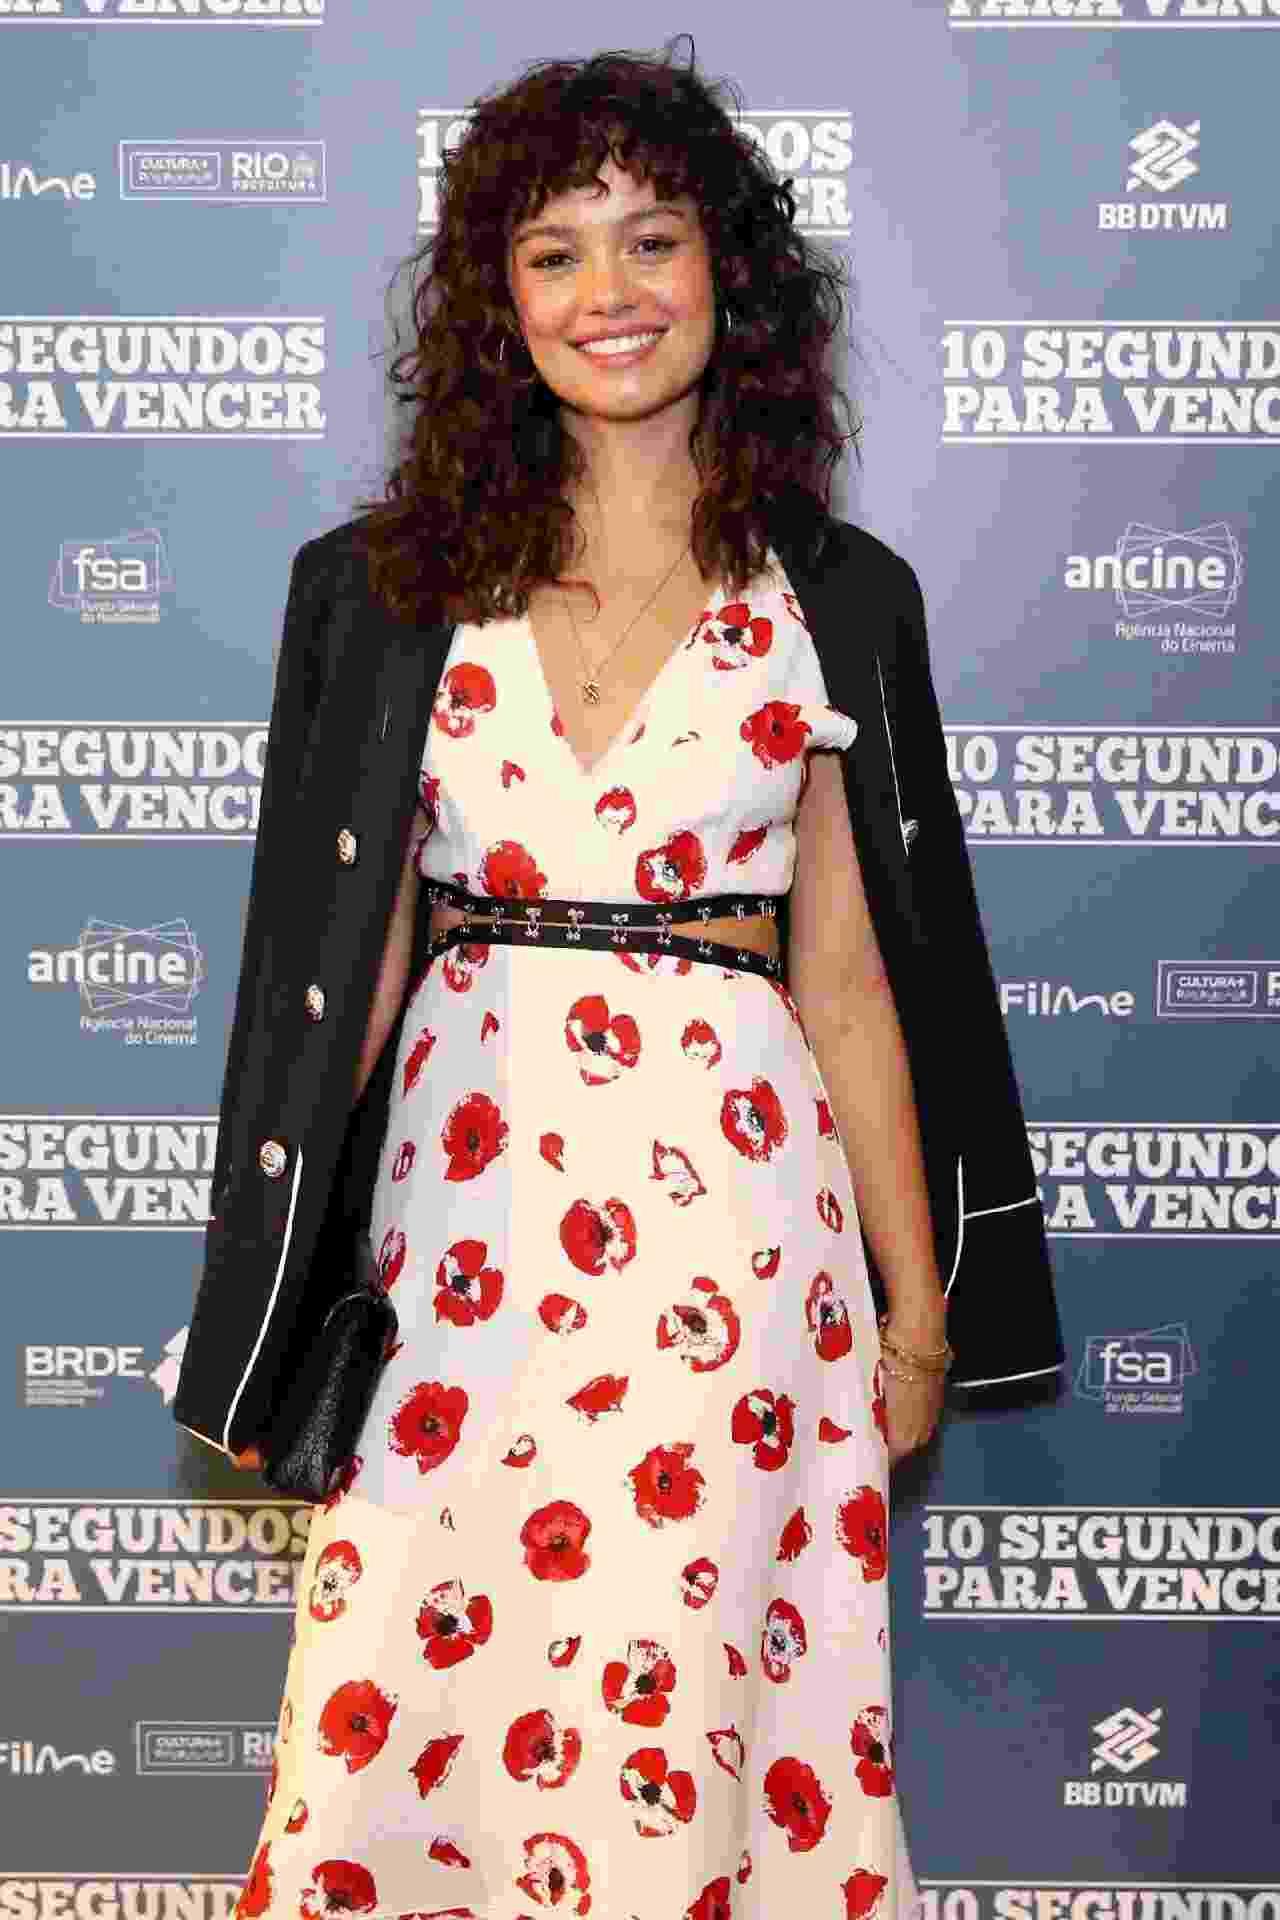 Sophie Charlotte - Manuela Scarpa/Brazil News